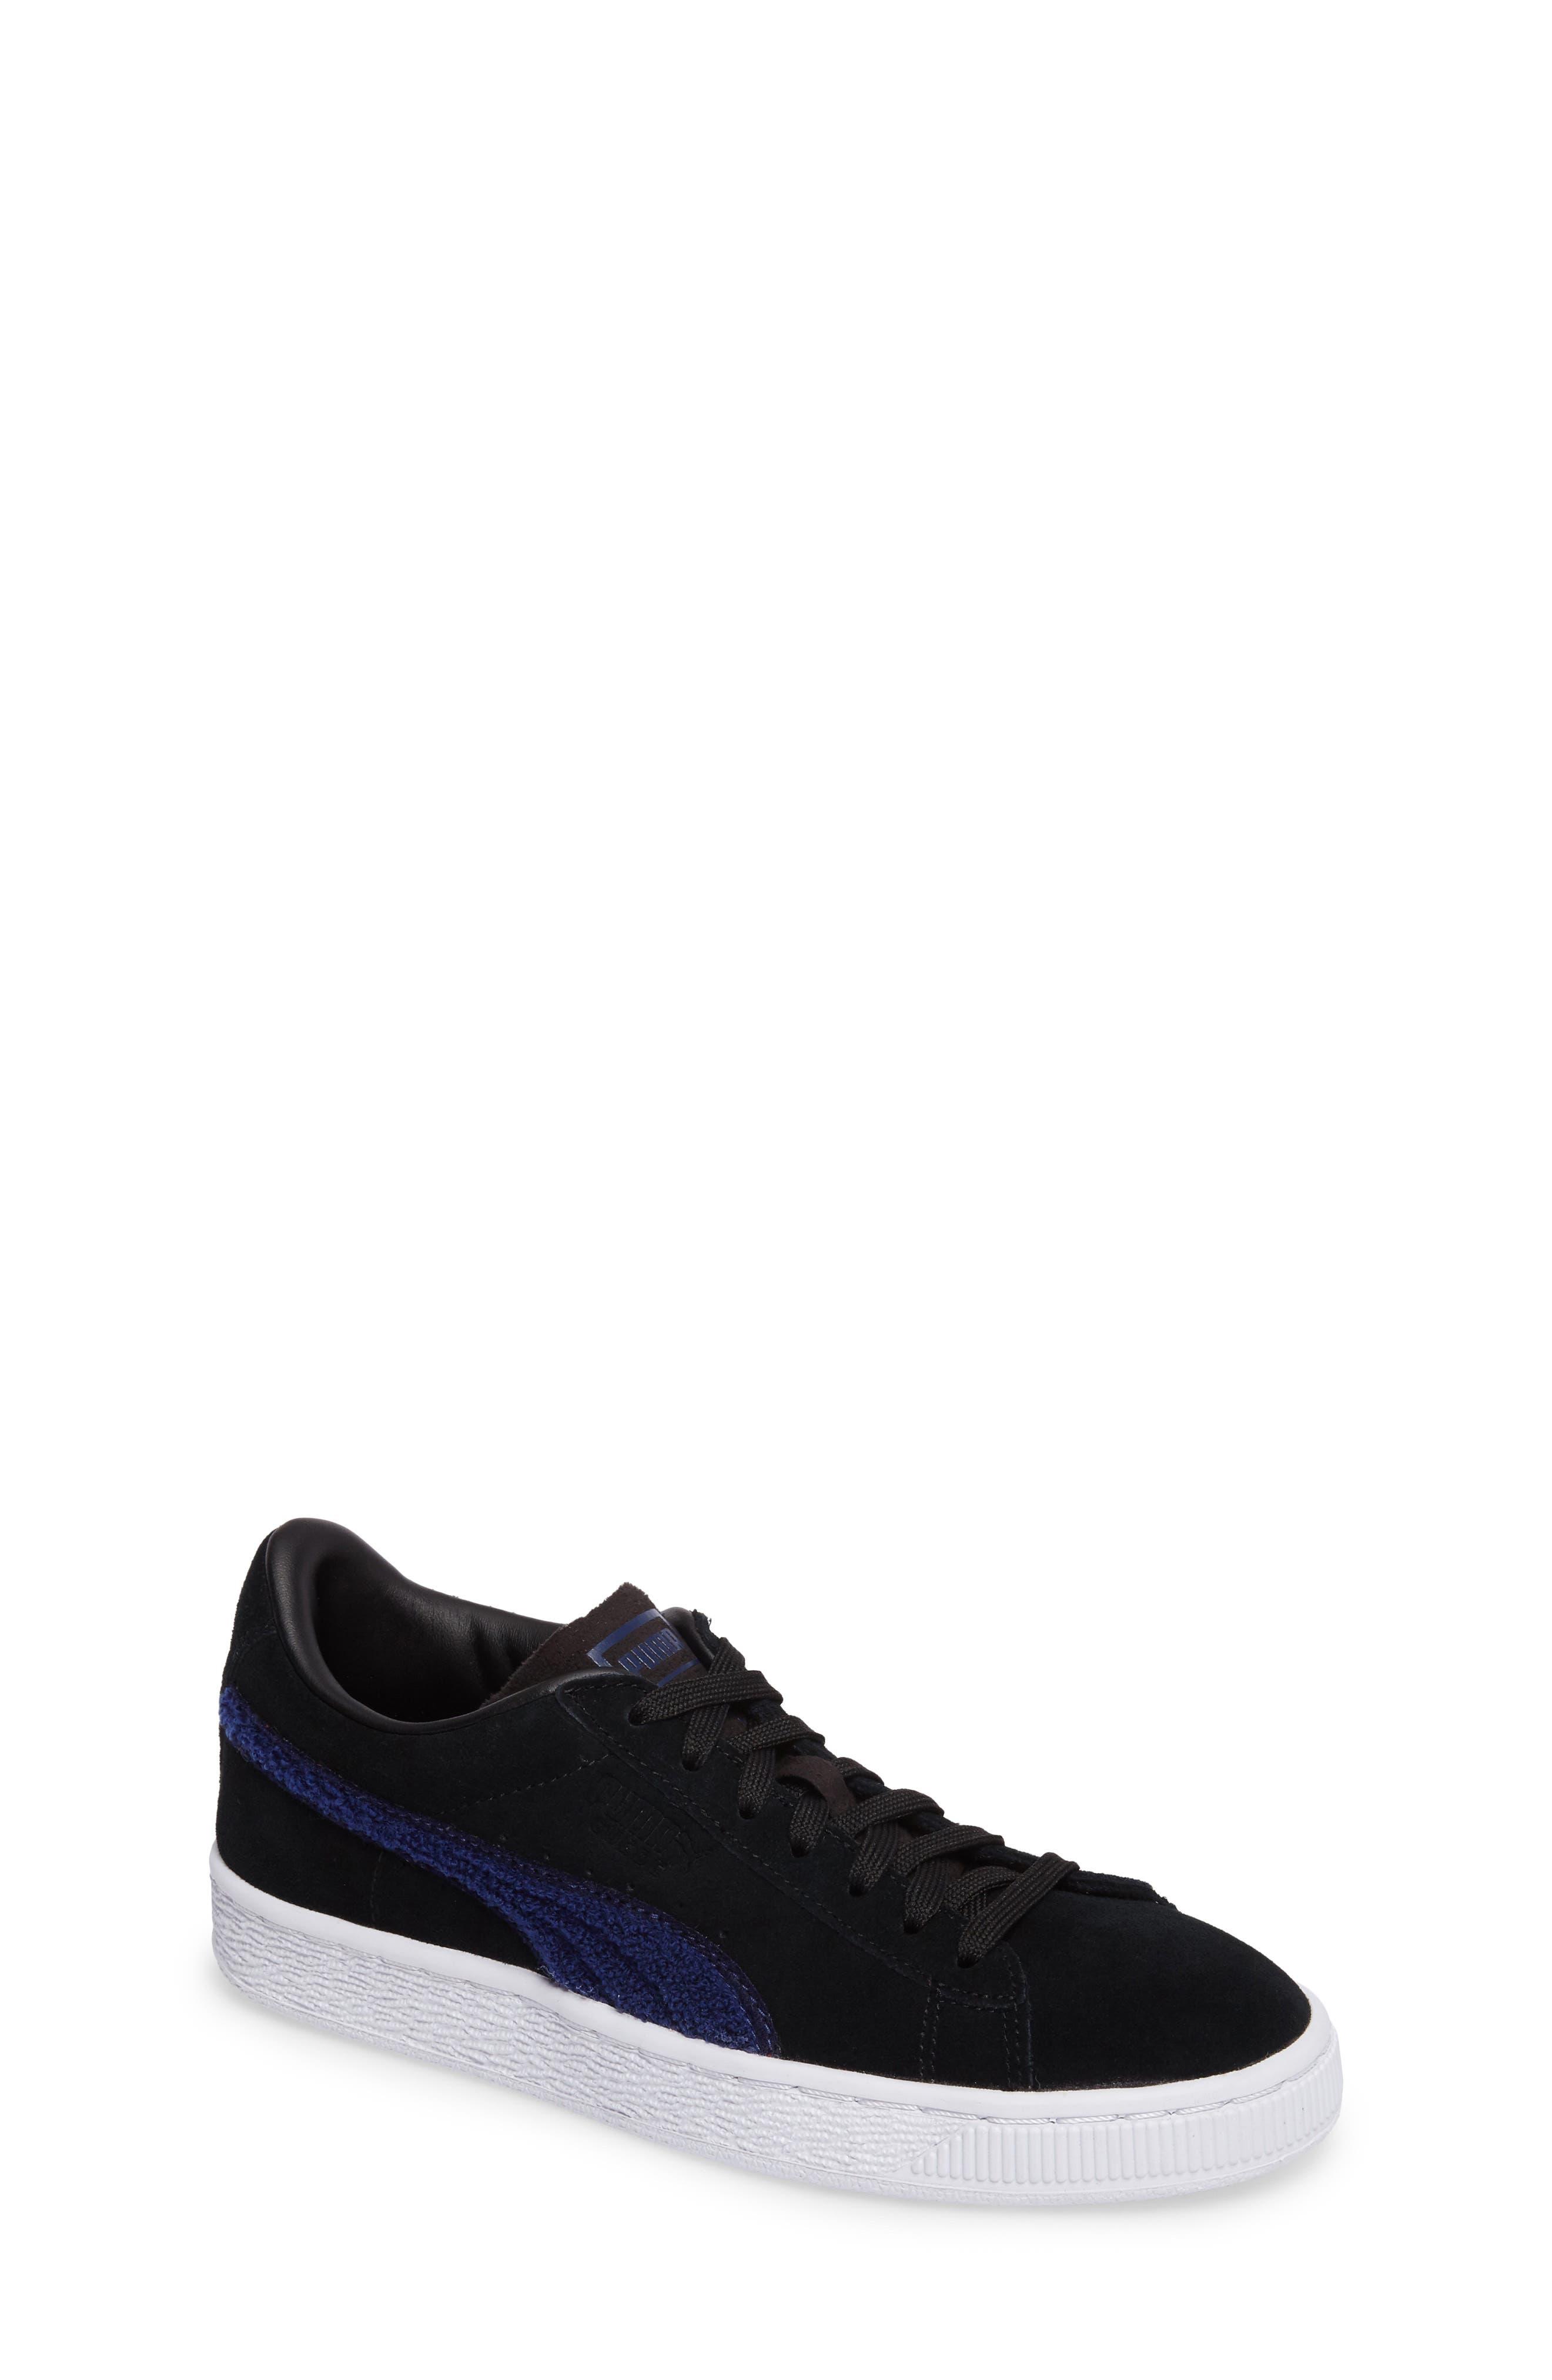 Classic Terry Jr Sneaker,                         Main,                         color, Black